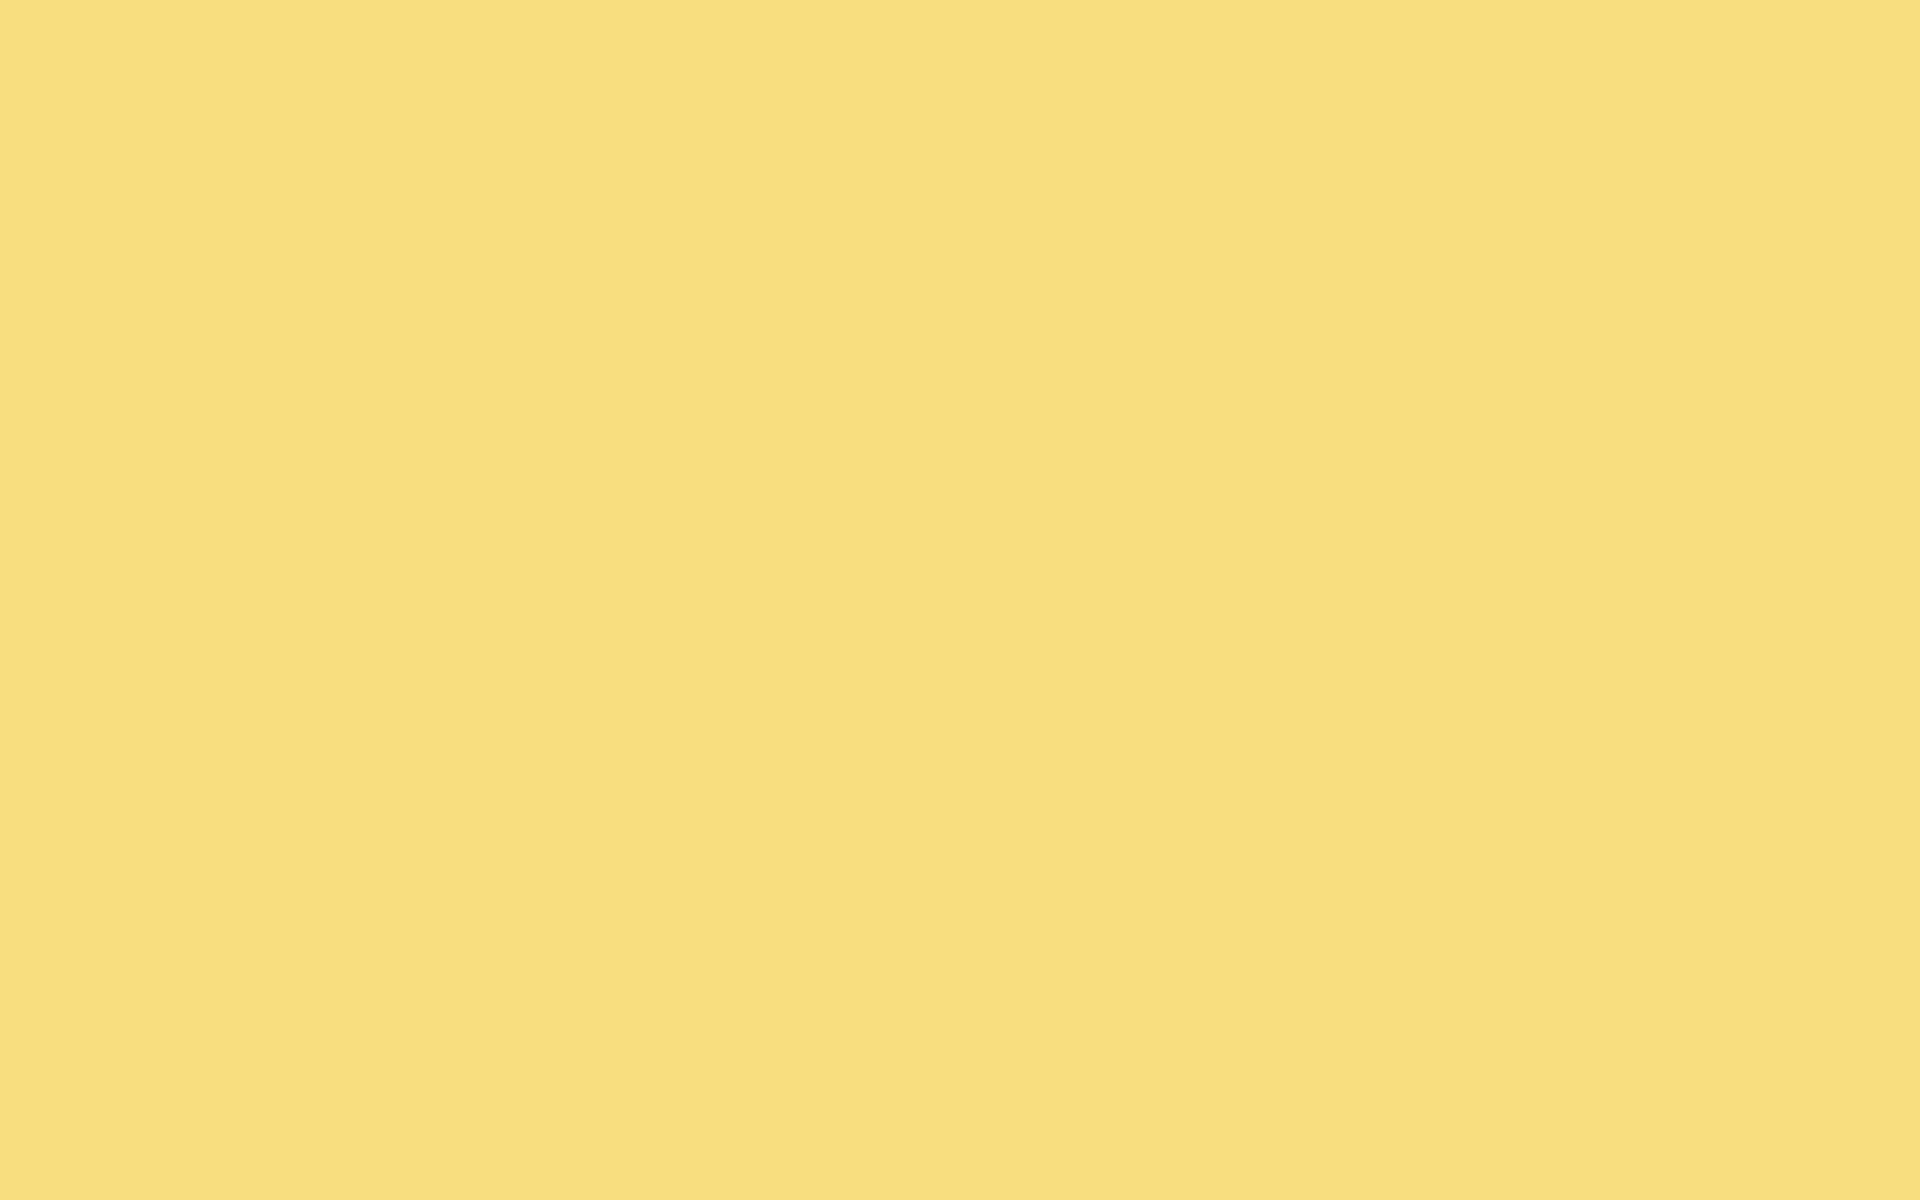 1920x1200 Jasmine Solid Color Background